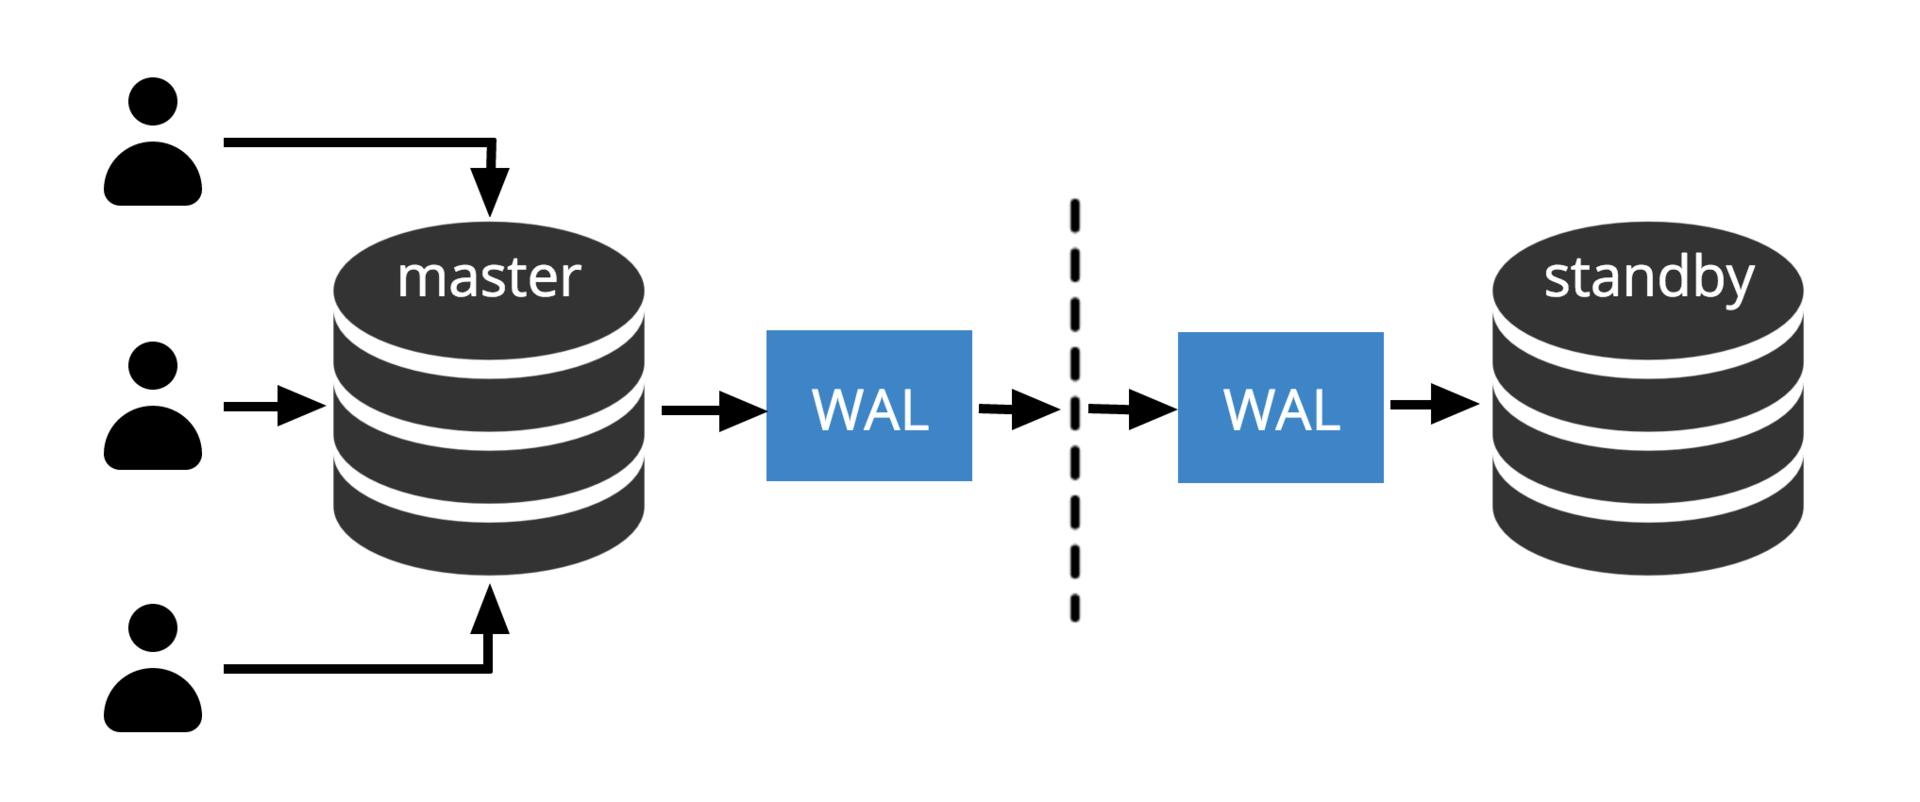 Rethinkdb vs postgresql download